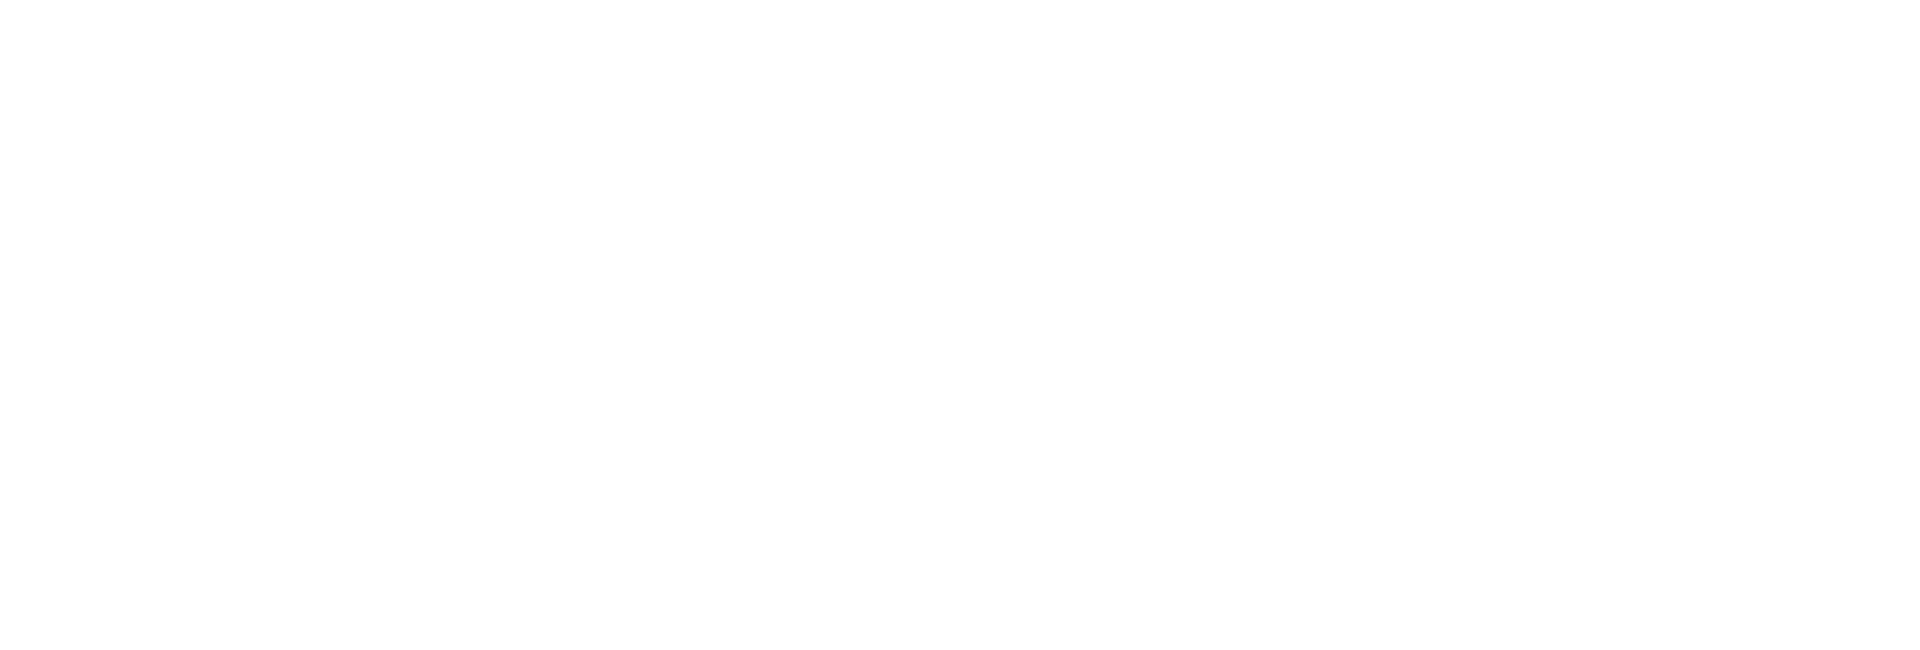 Recipe6 깊어 가는 가을의 스몰 트립 Bake PANINI bag.